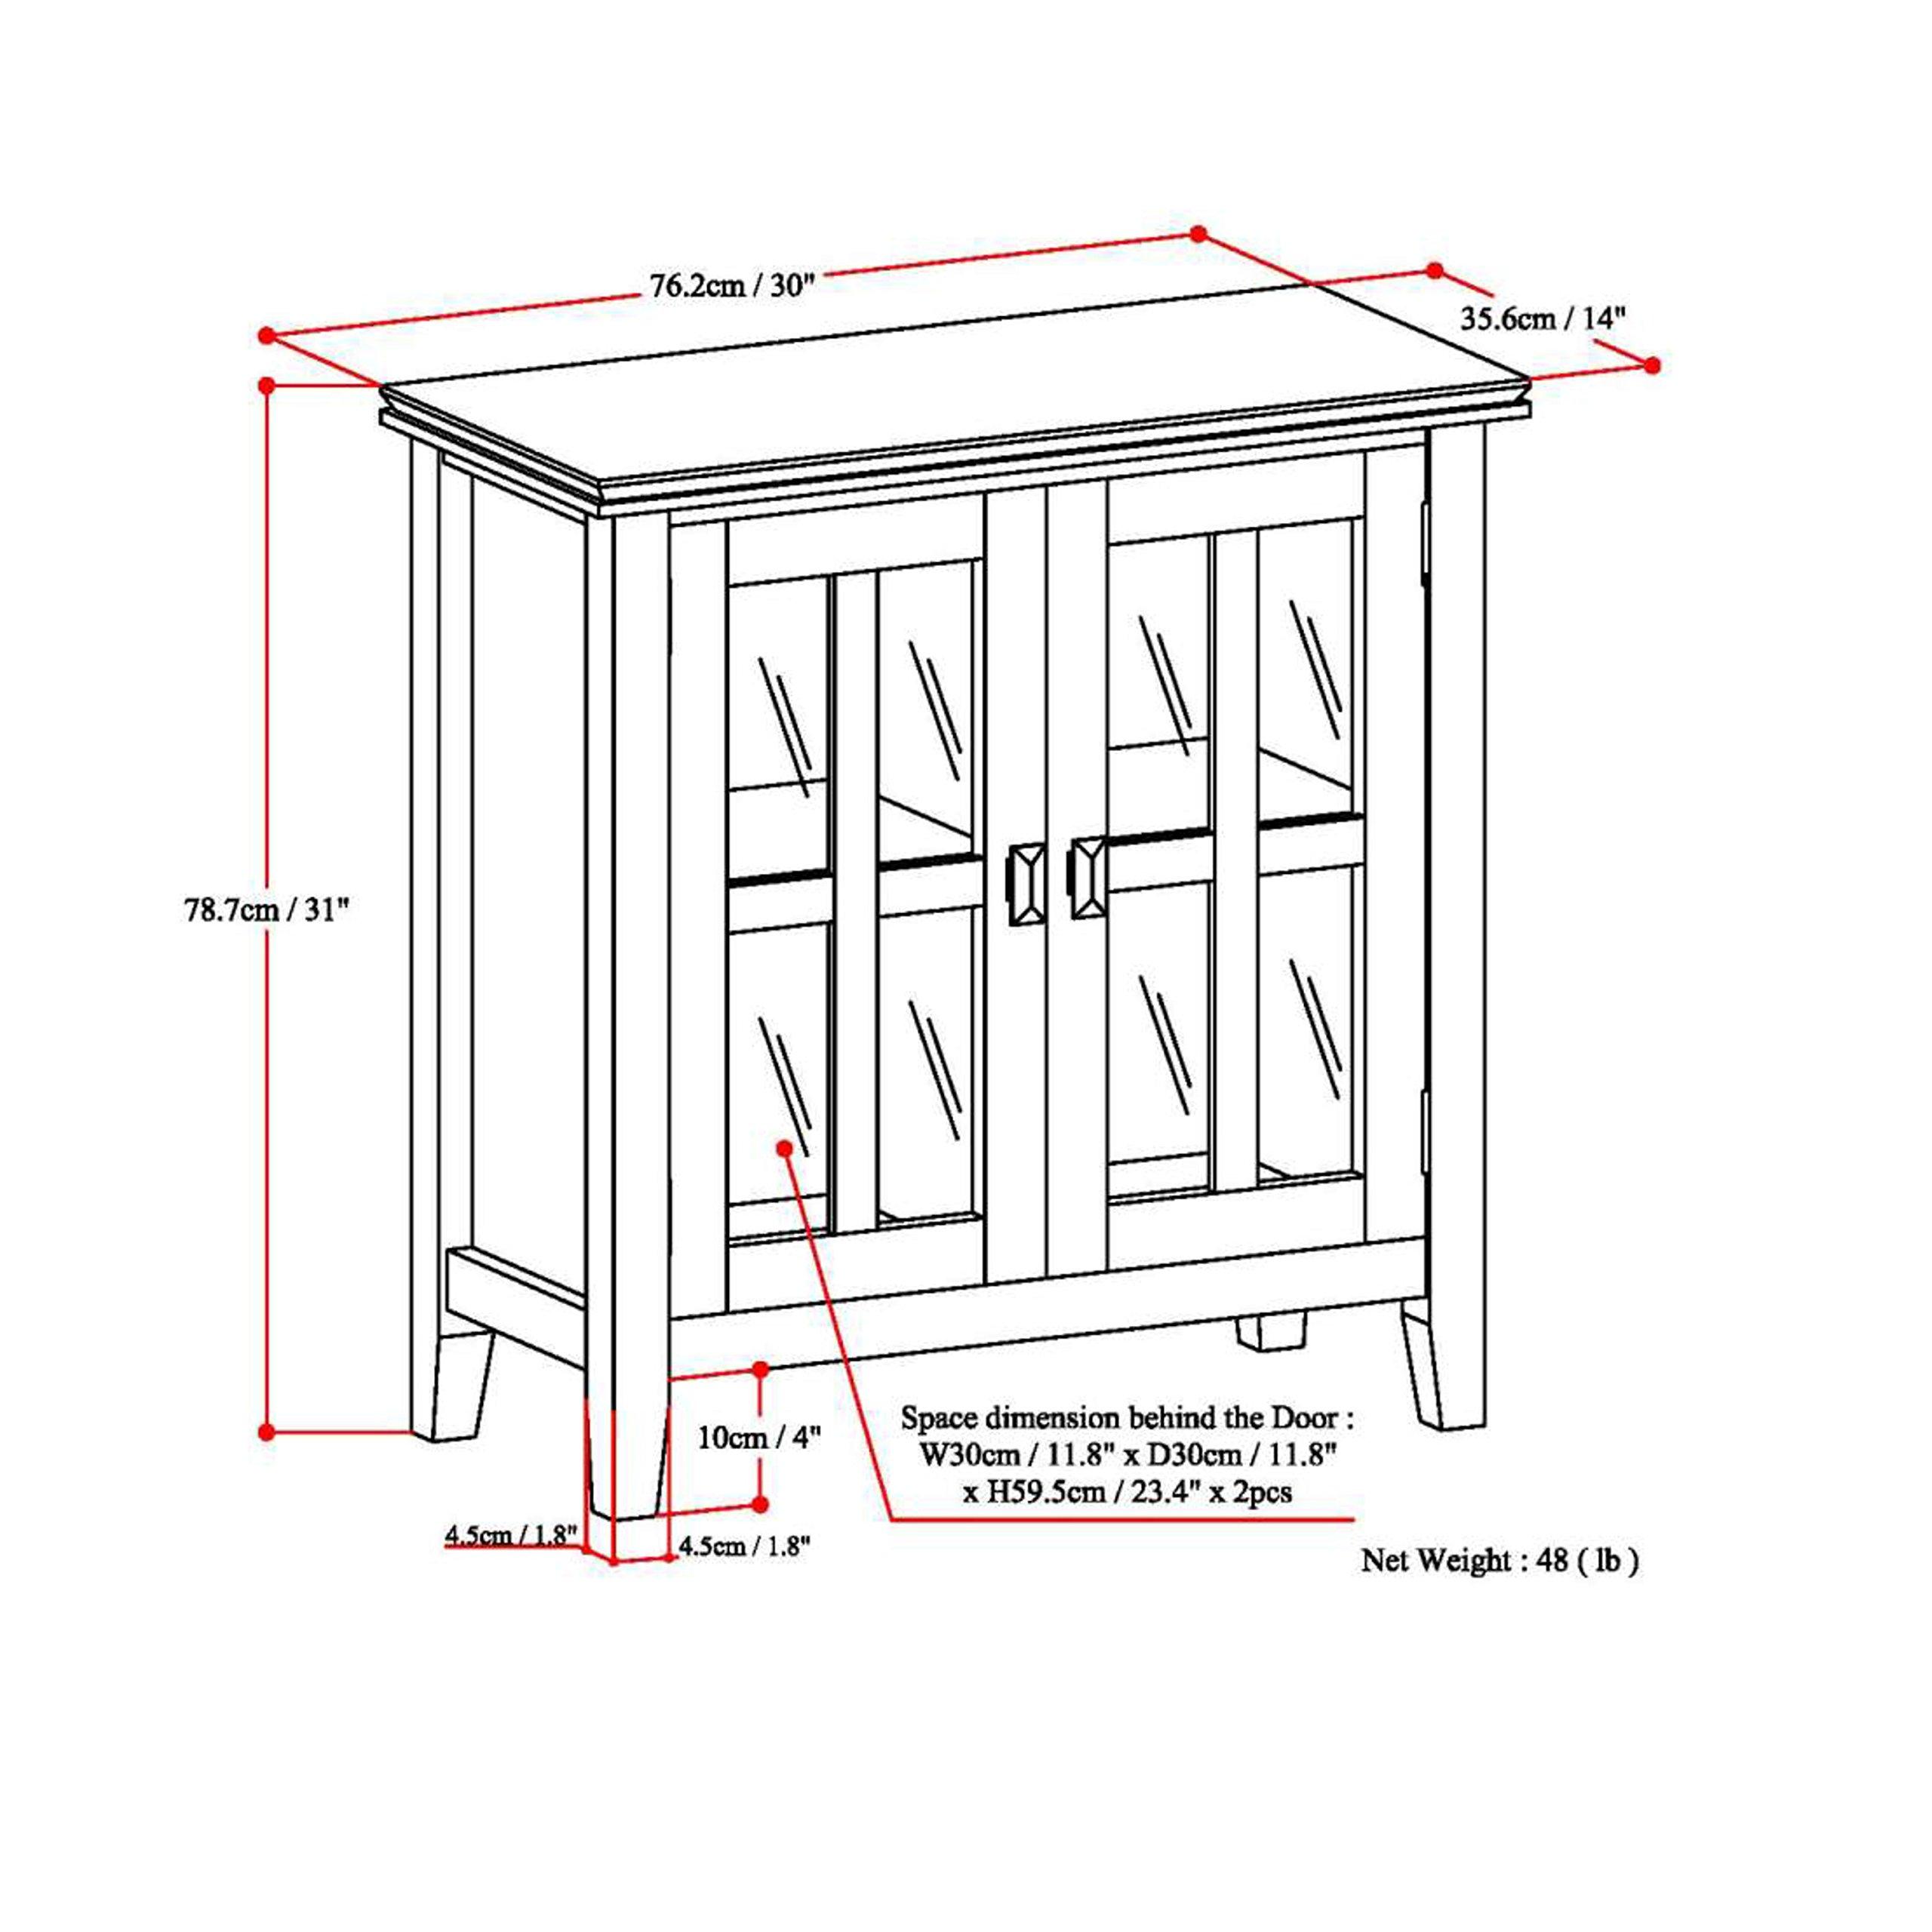 Simpli Home Artisan Solid Wood Low Storage Cabinet, Medium Auburn Brown by Simpli Home (Image #6)